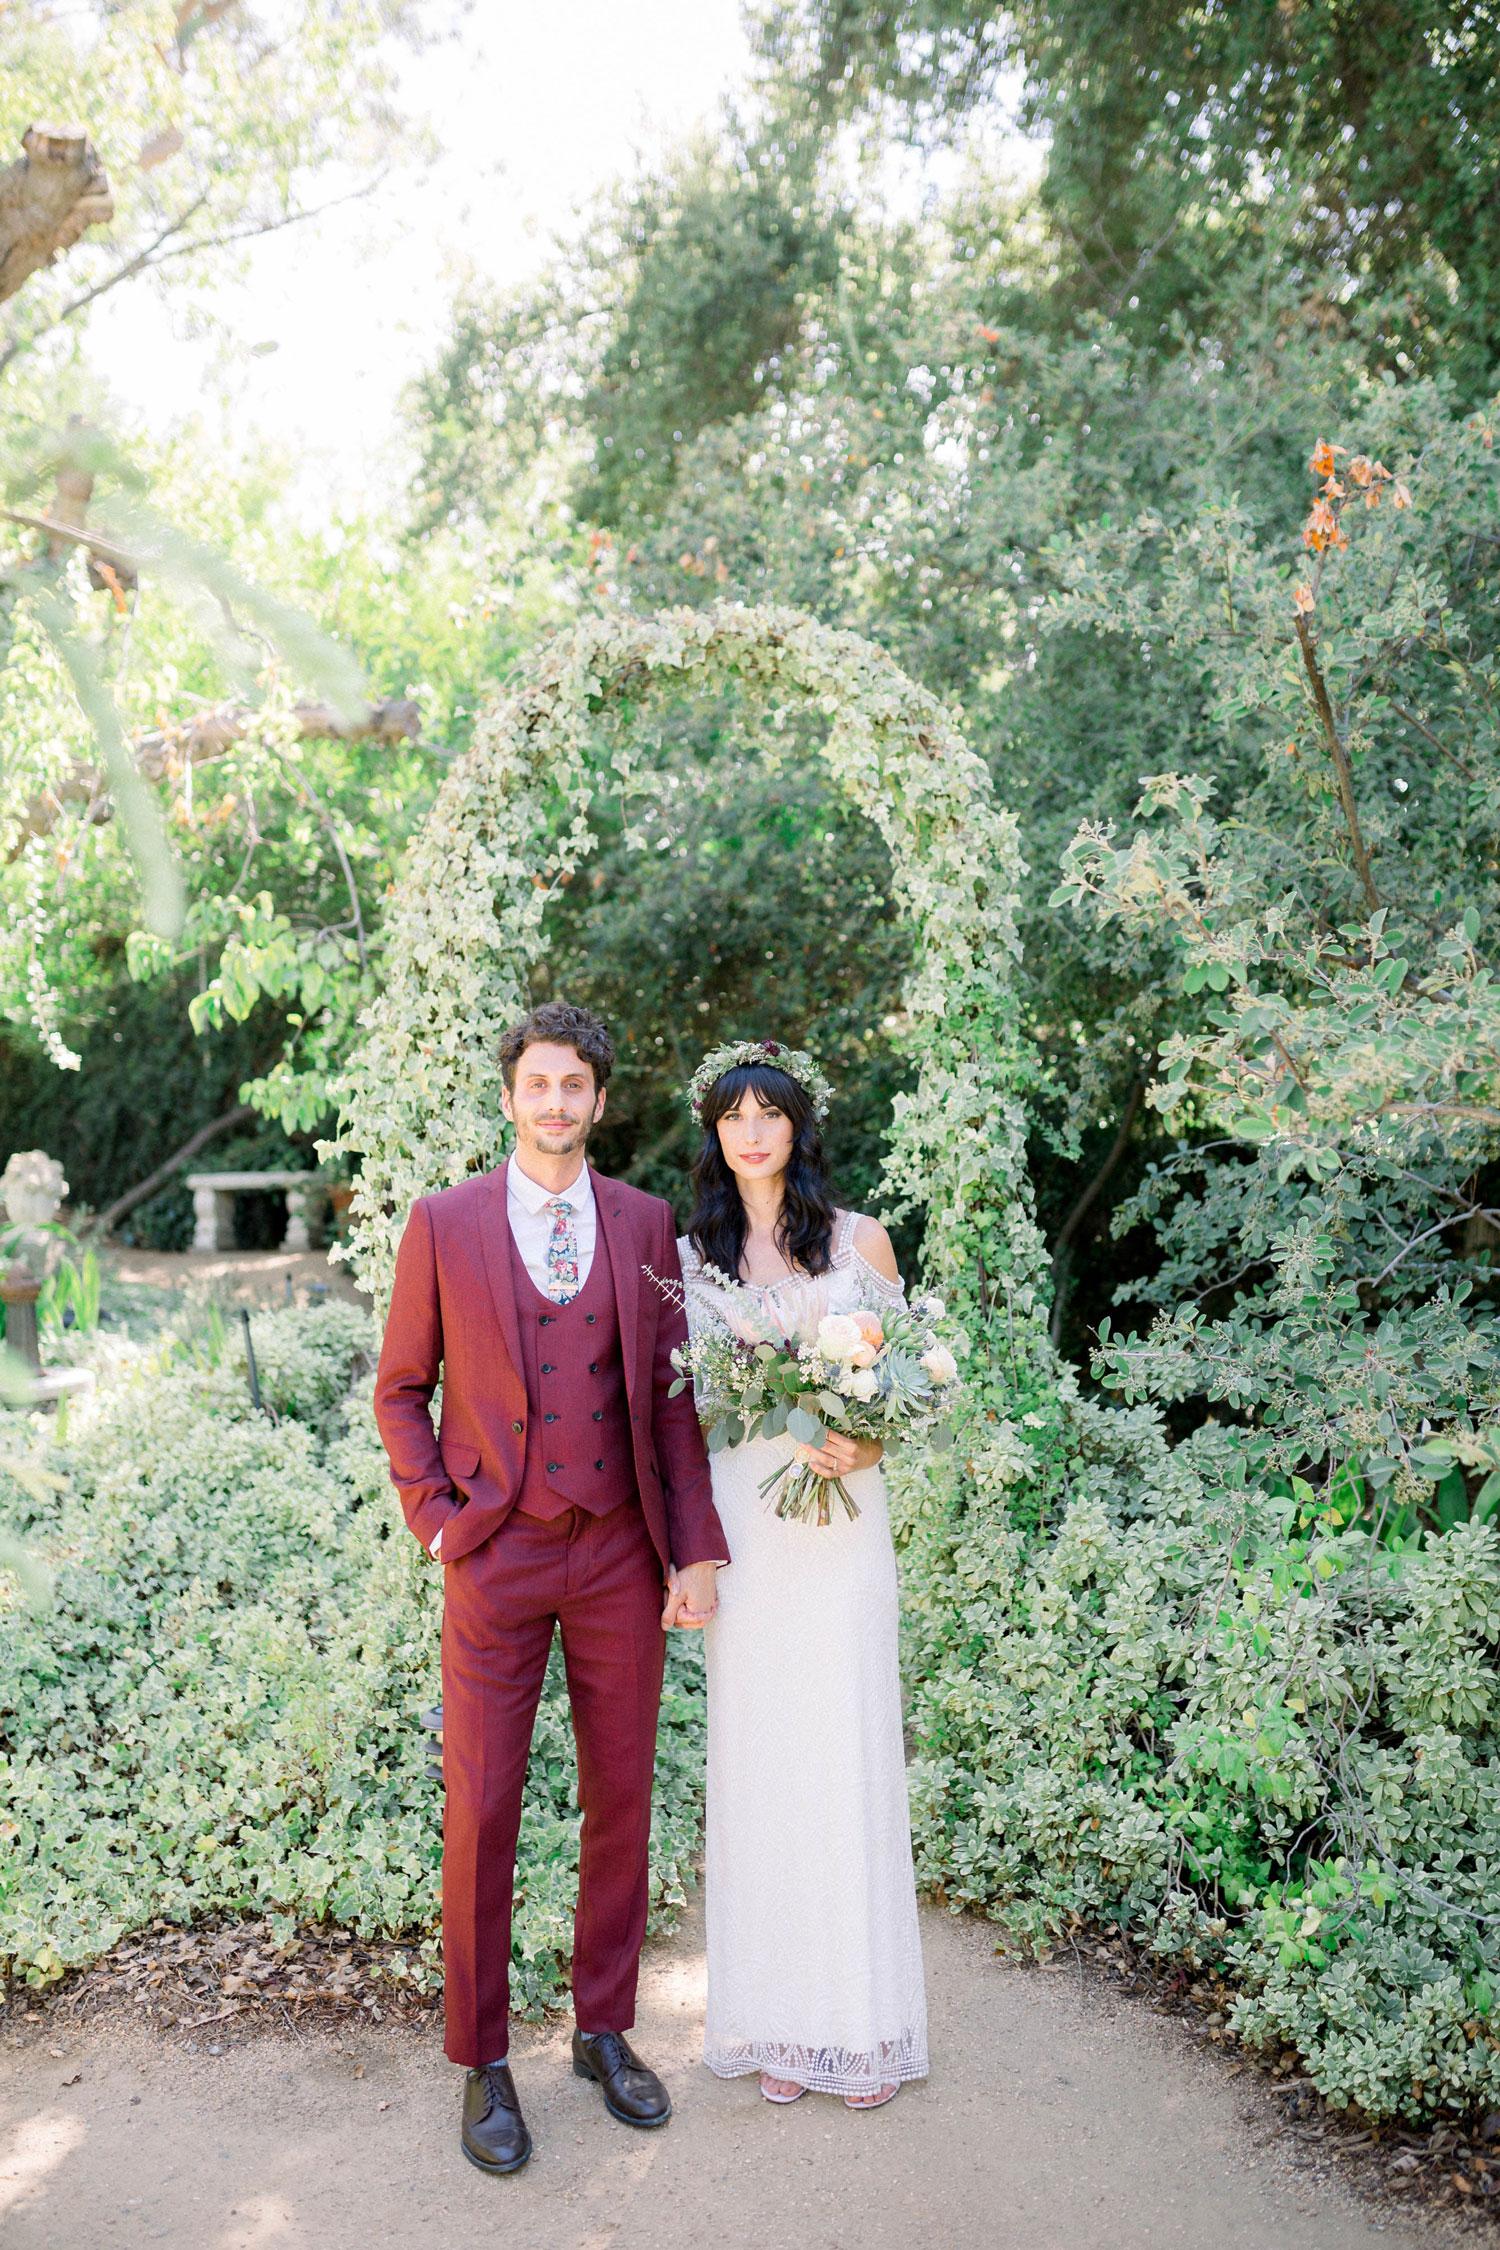 Vegan wedding couple ashley frohnert and tony safran